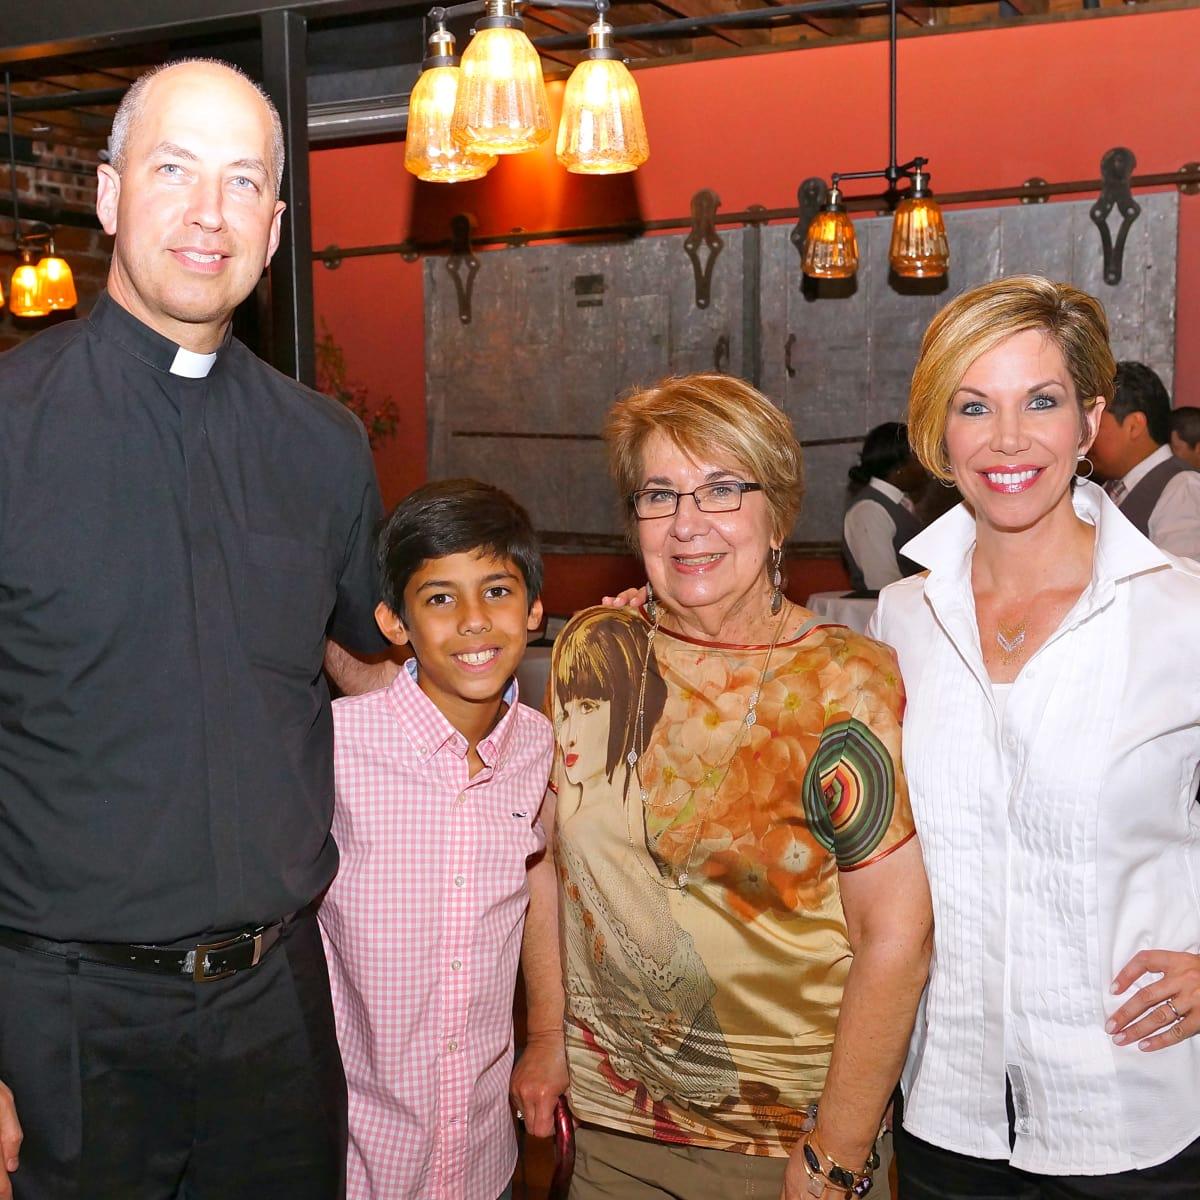 Houston, Roseann Rogers and Lara Bell birthday party, August 2015, Father Joe Rogers, Nikhil Shah, Judy Rogers, Roseann Rogers